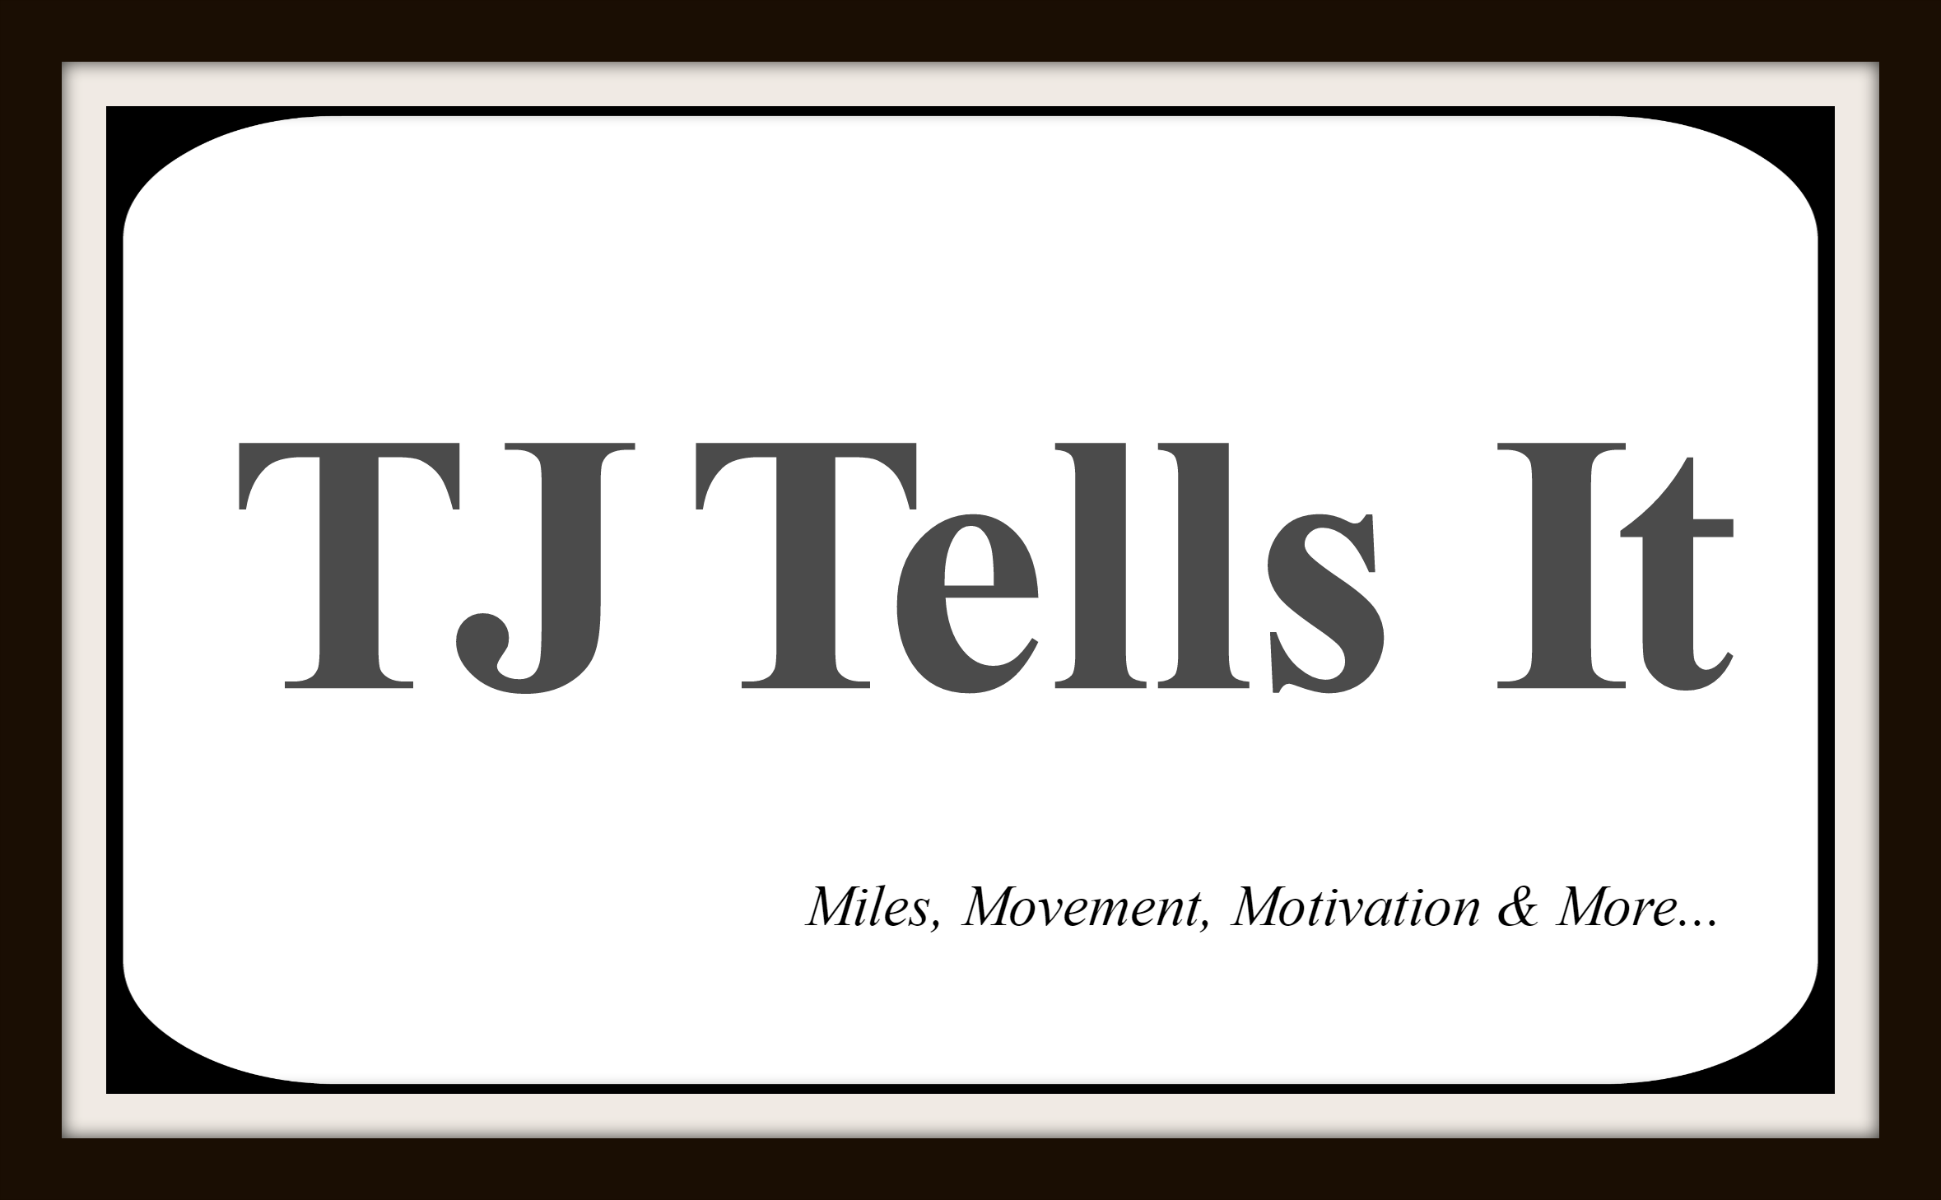 TJTellsItHeader2017 with tag